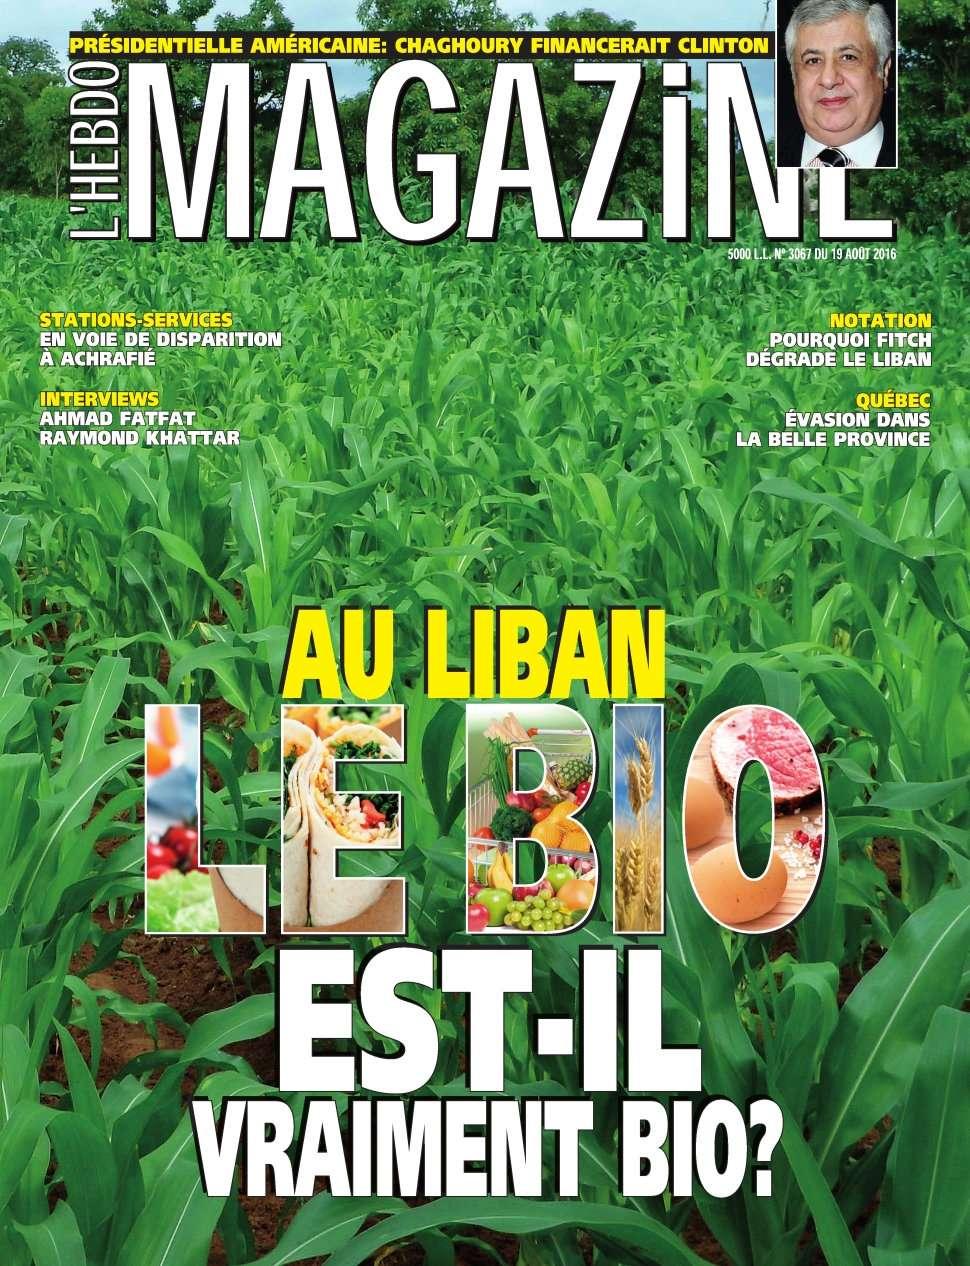 L'Hebdo Magazine 3067 - 19 Août 2016